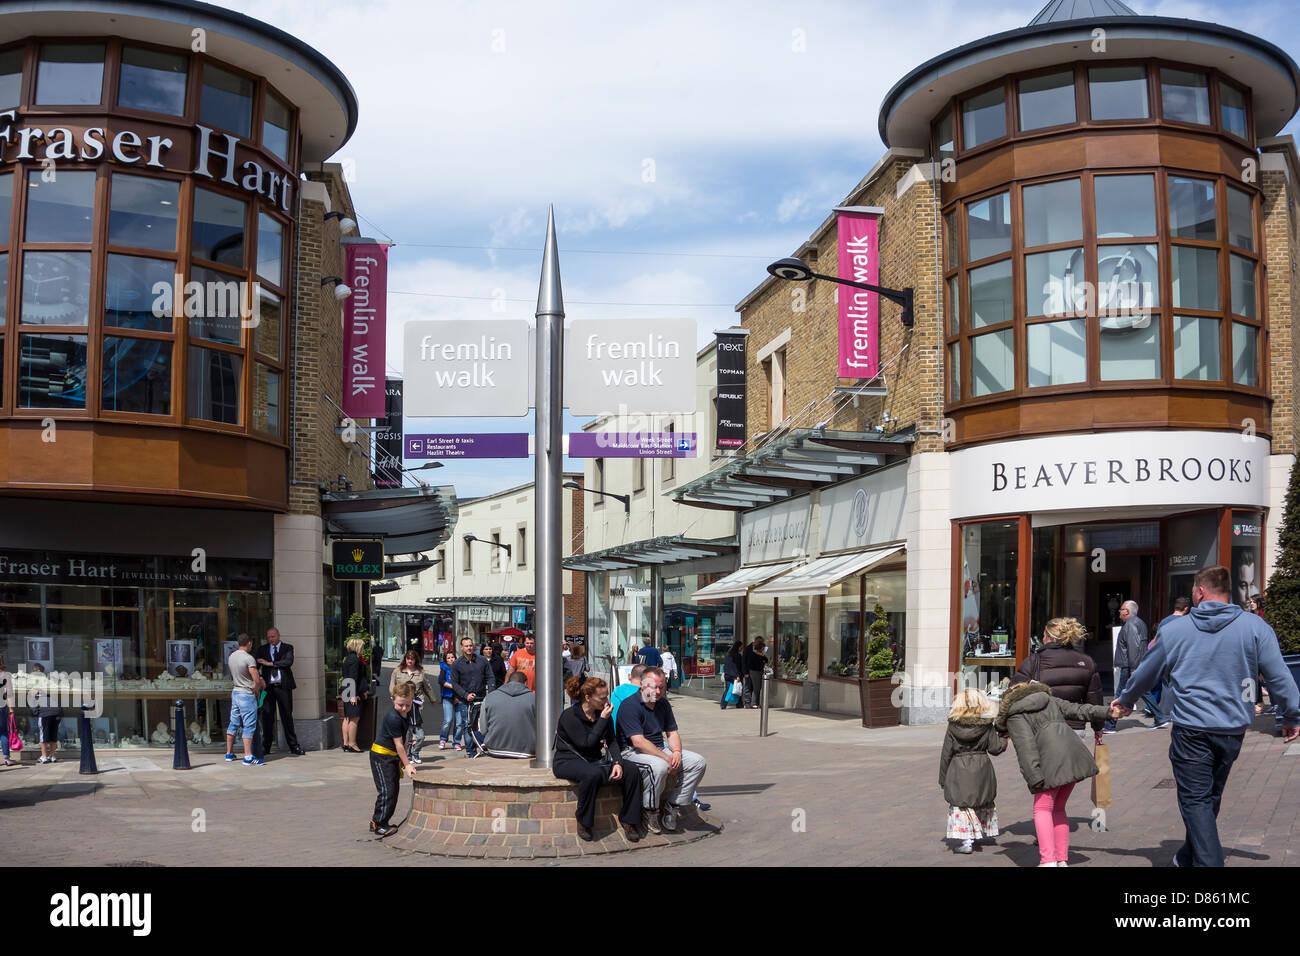 Fremlin Walk Shopping Precinct Maidstone Kent - Stock Image